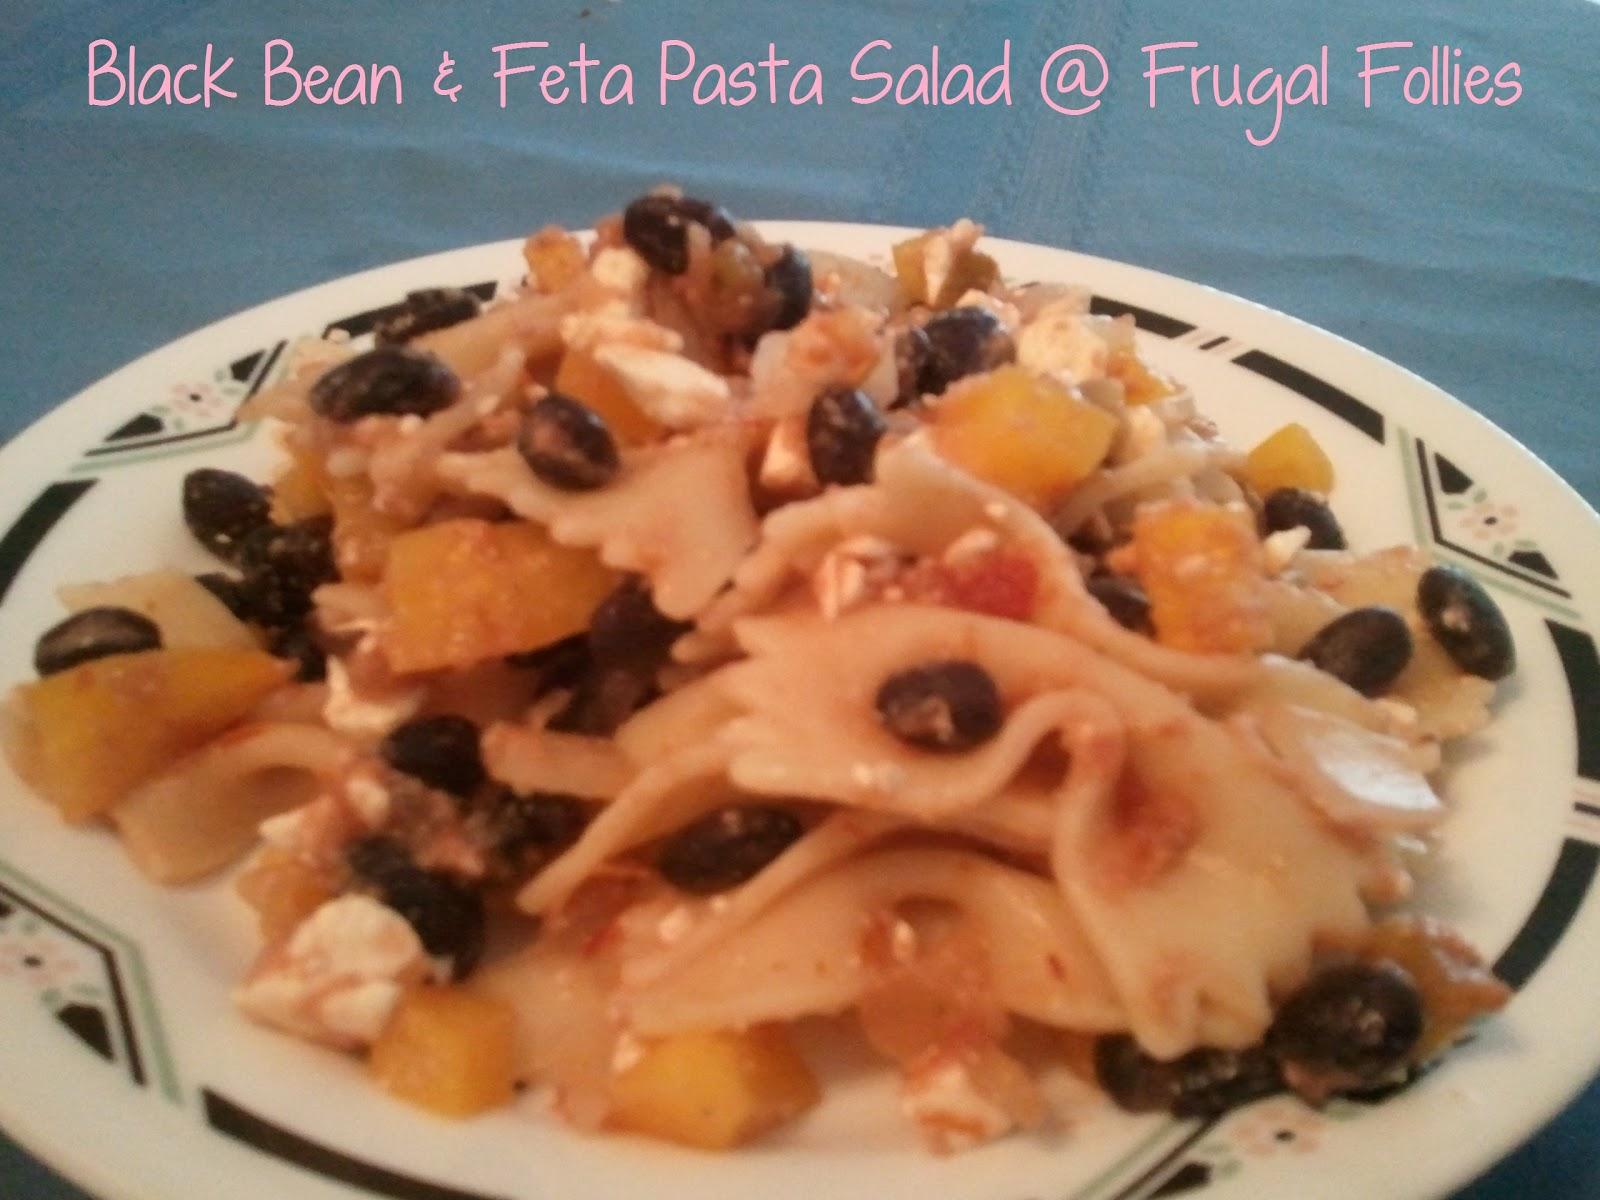 Black Bean and Feta Pasta Salad (Frugal Food Thursday) | Frugal ...